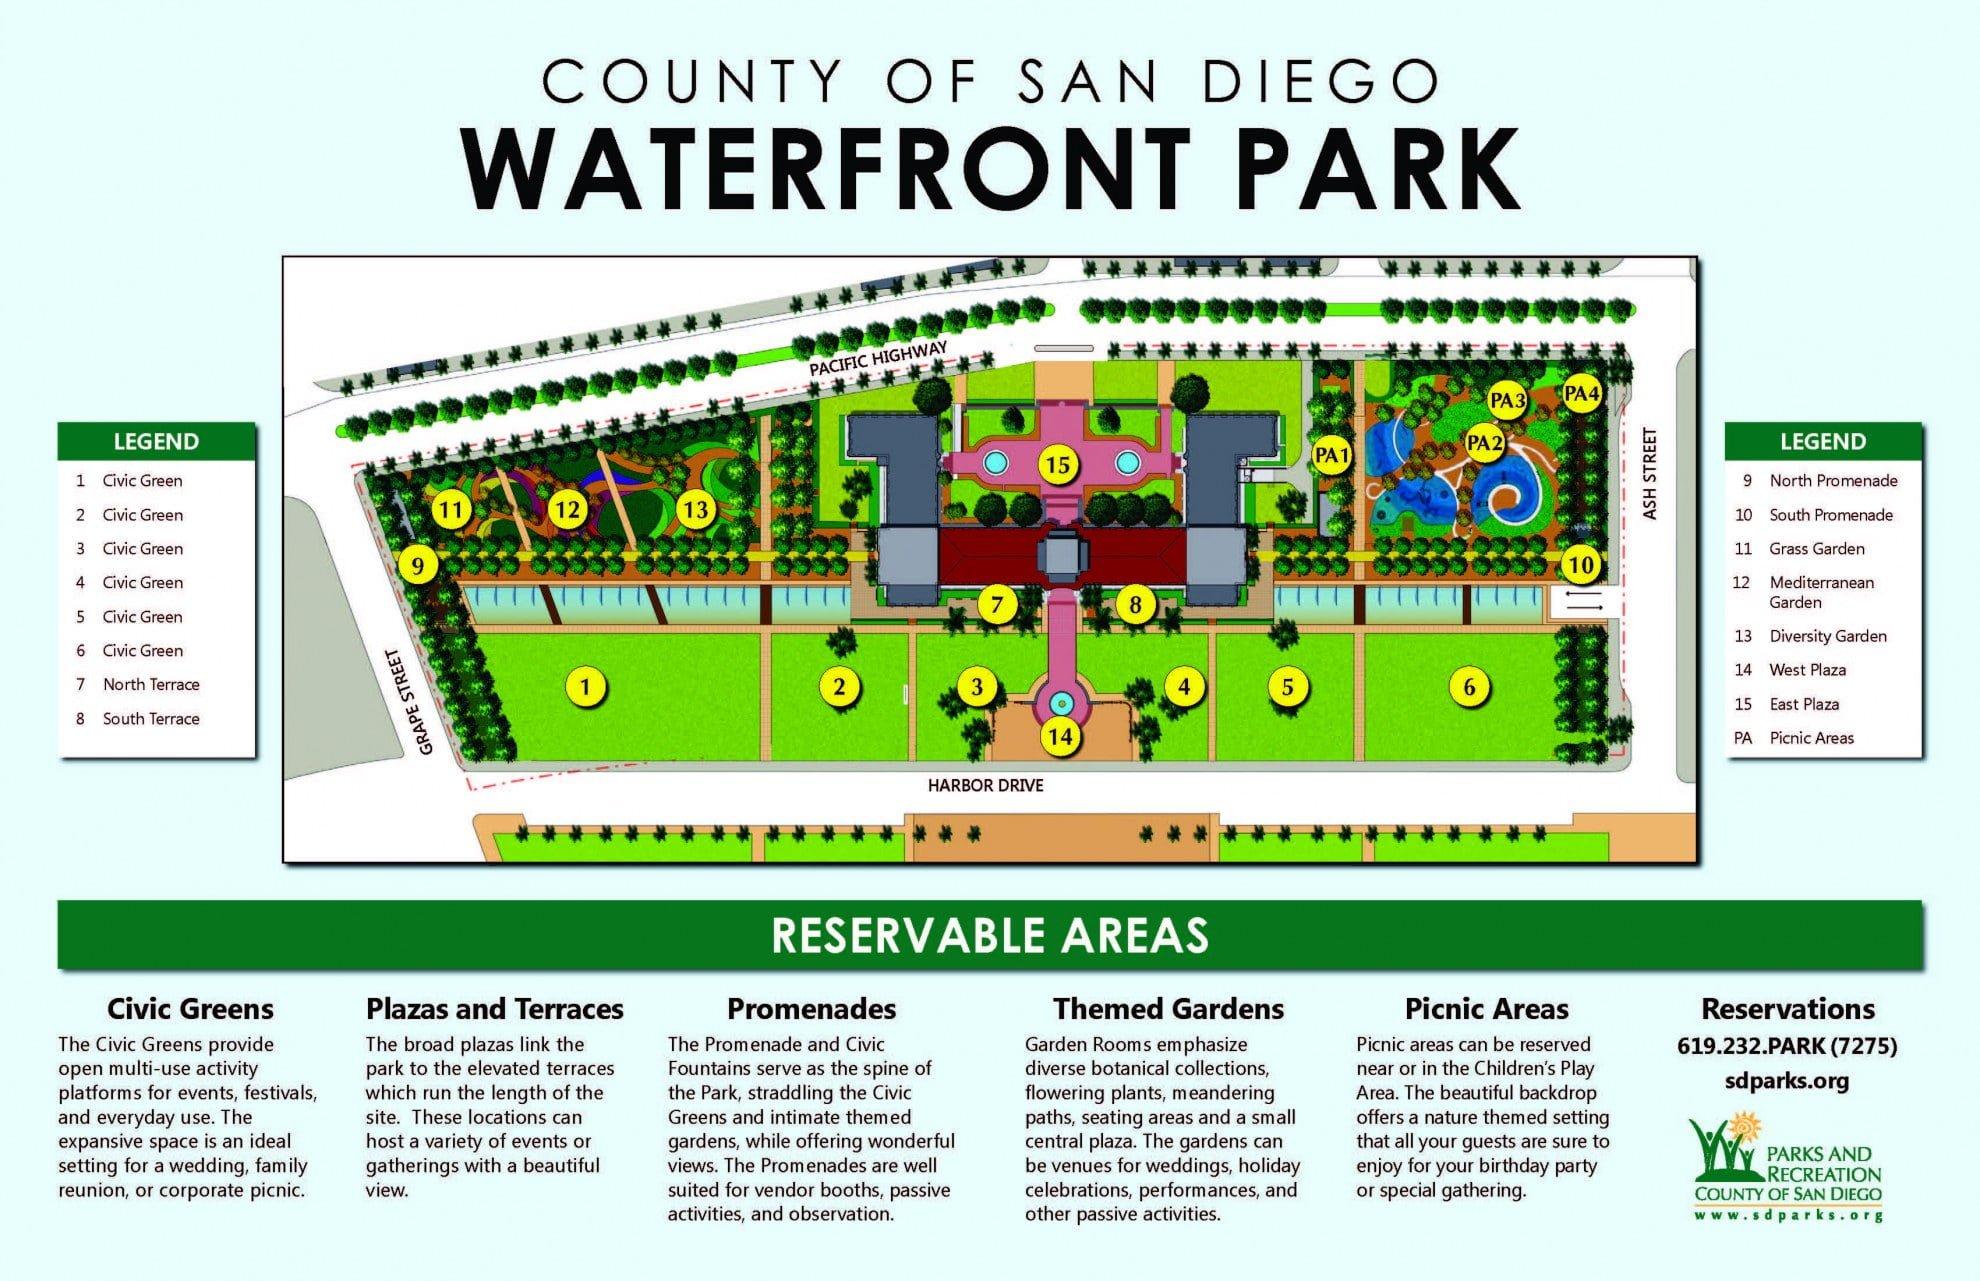 WaterfrontParkReserveAreas